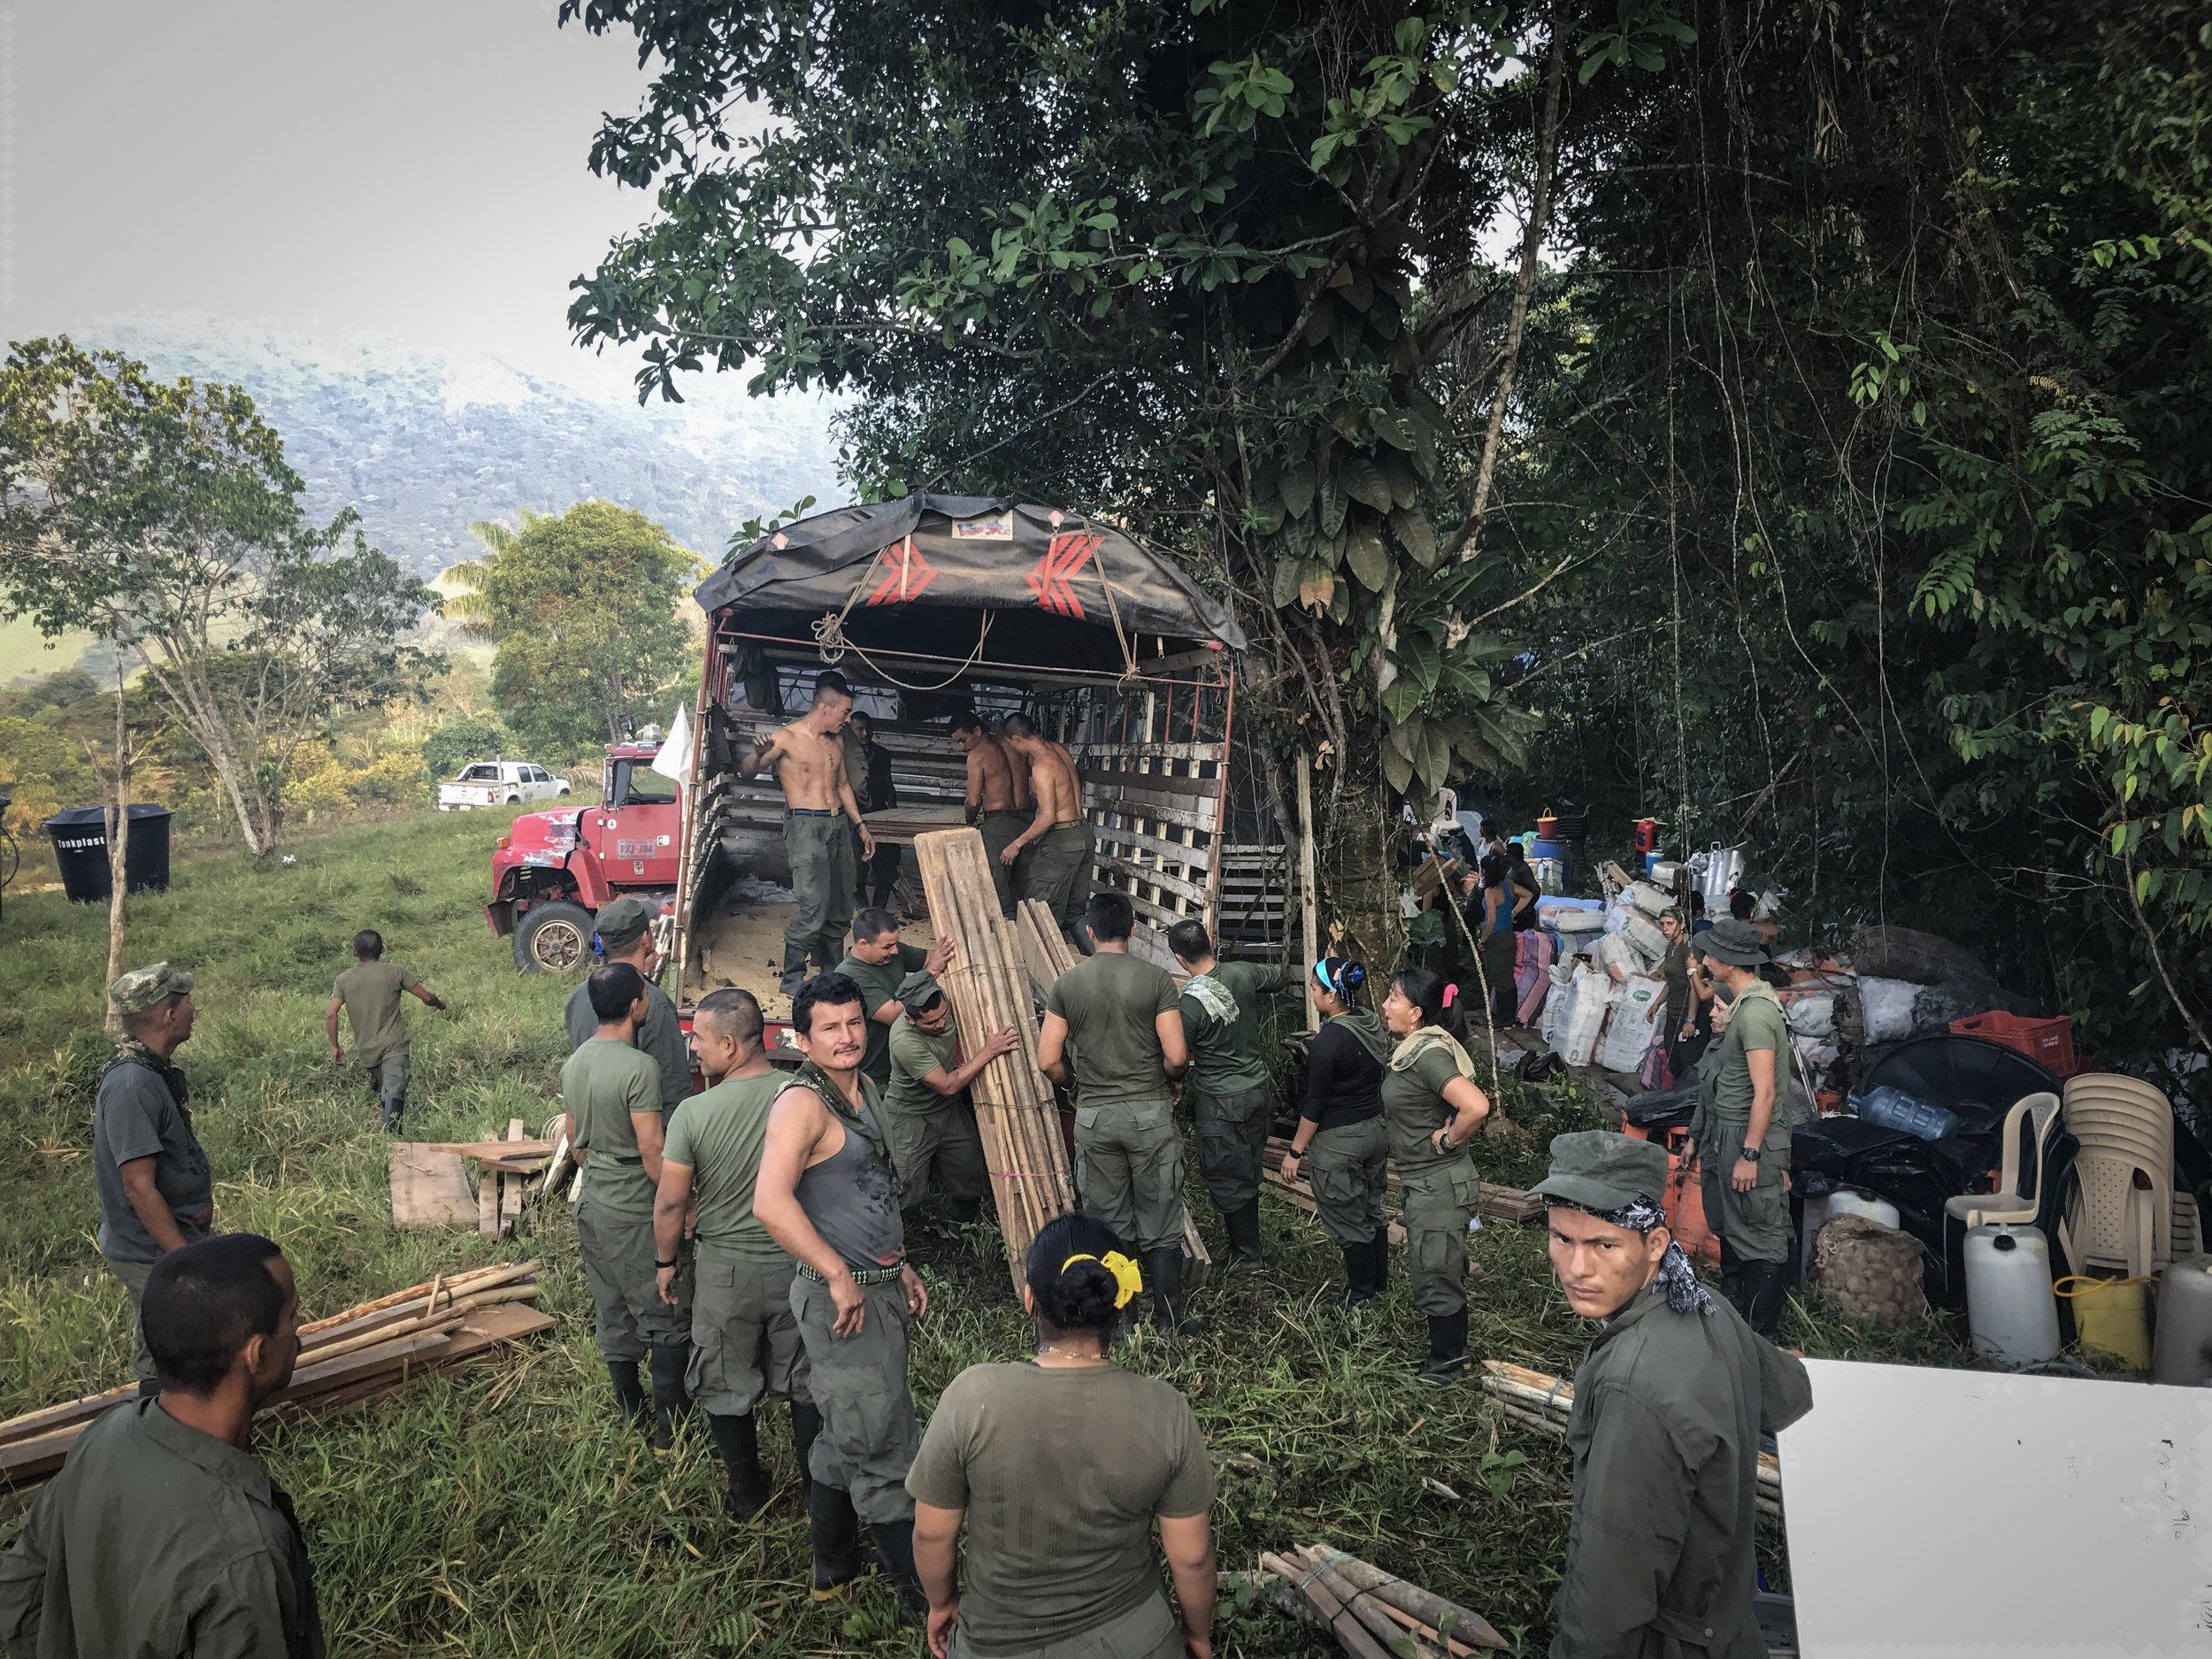 The guerrillero removal continues in Montañita.